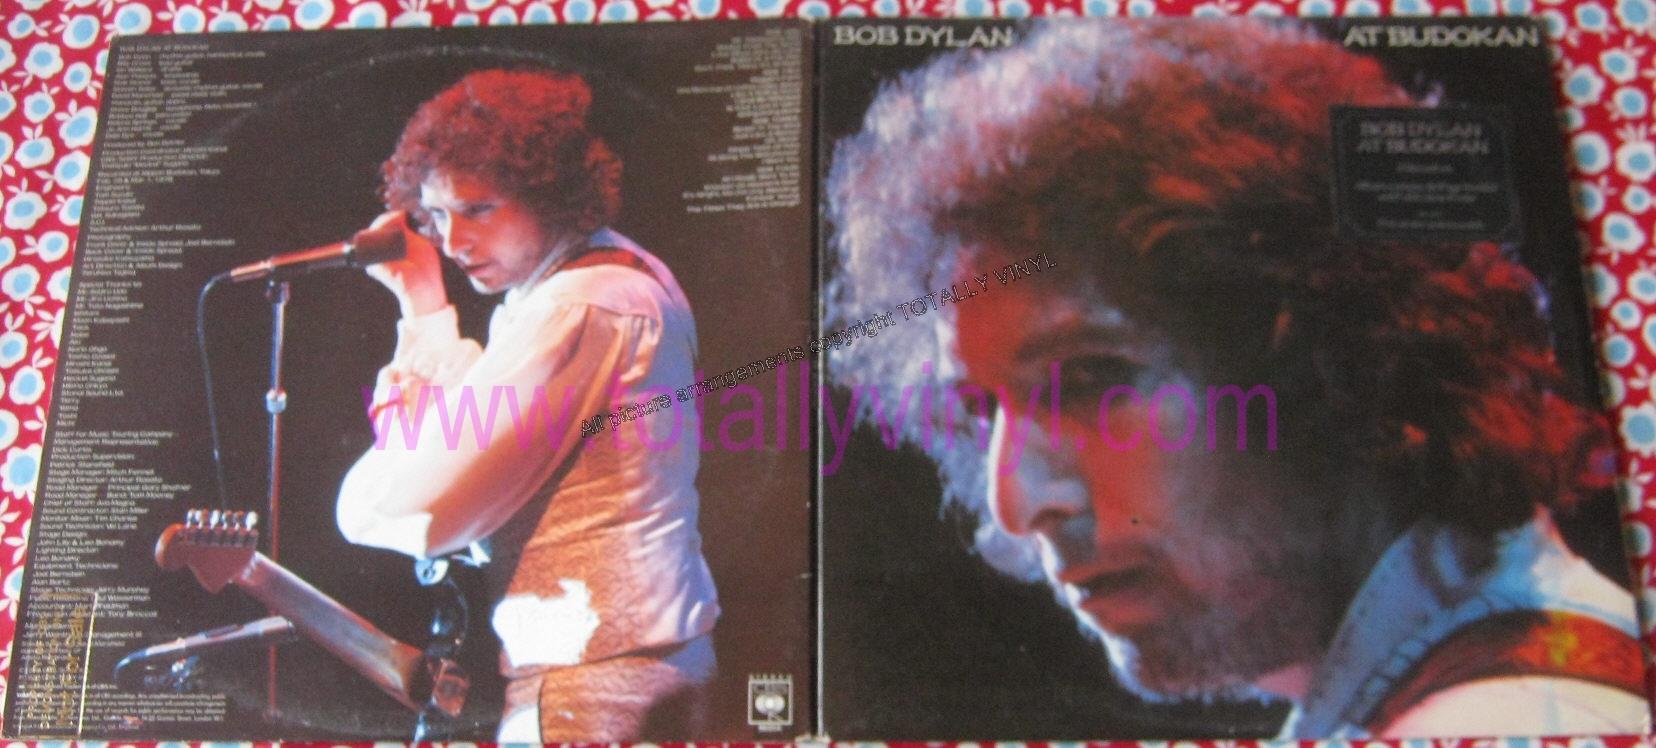 Totally Vinyl Records Dylan Bob At Budokan Lp Poster